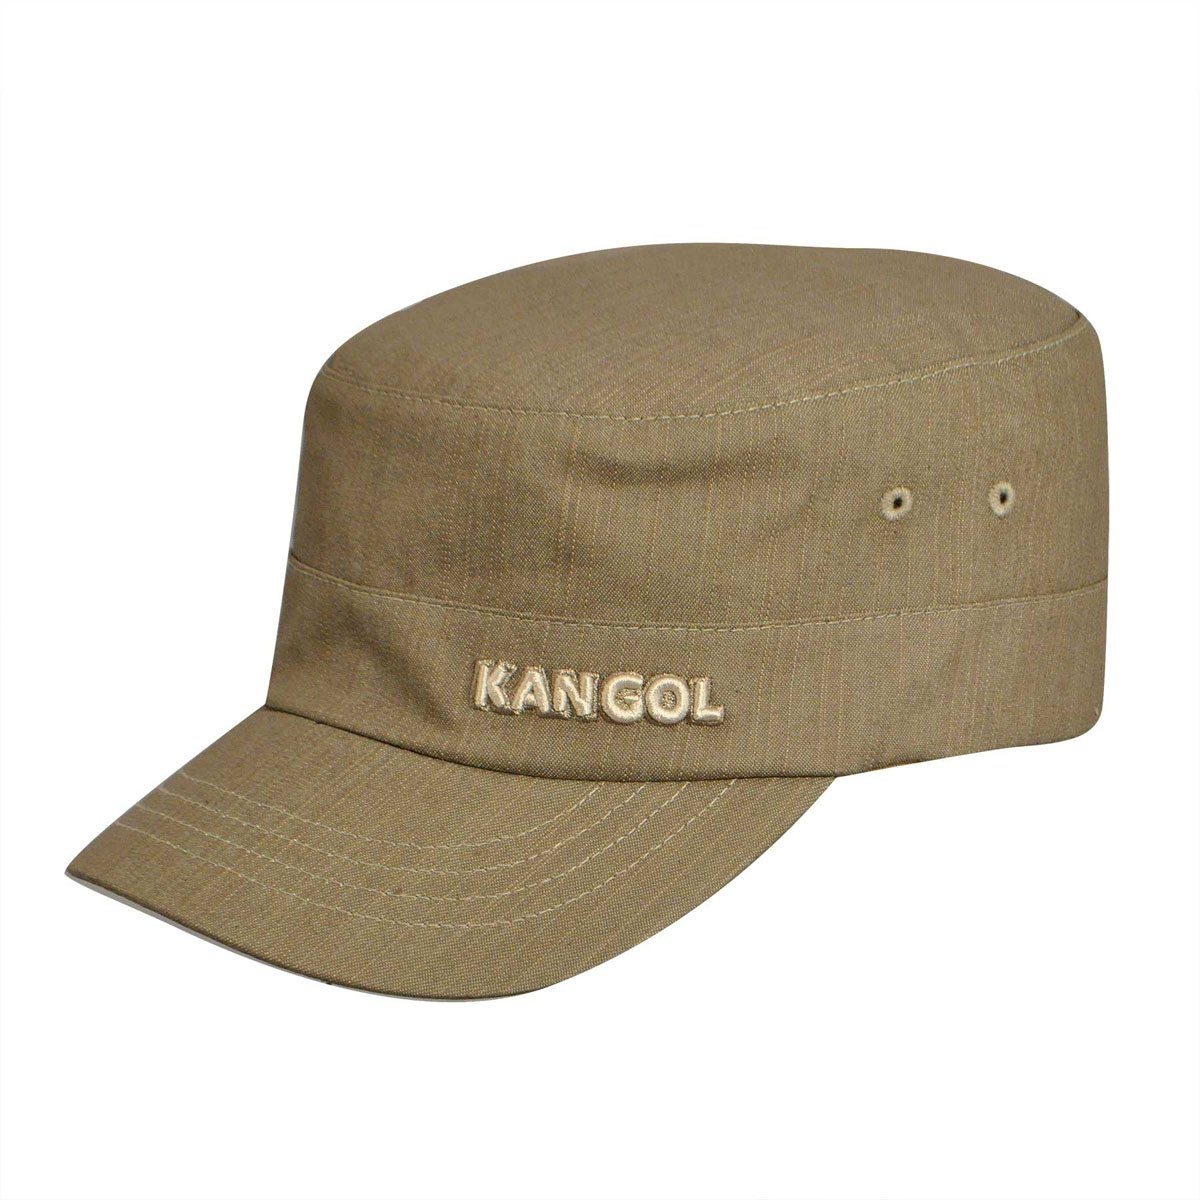 Kangol Denim Flexfit Army Cap in Beige